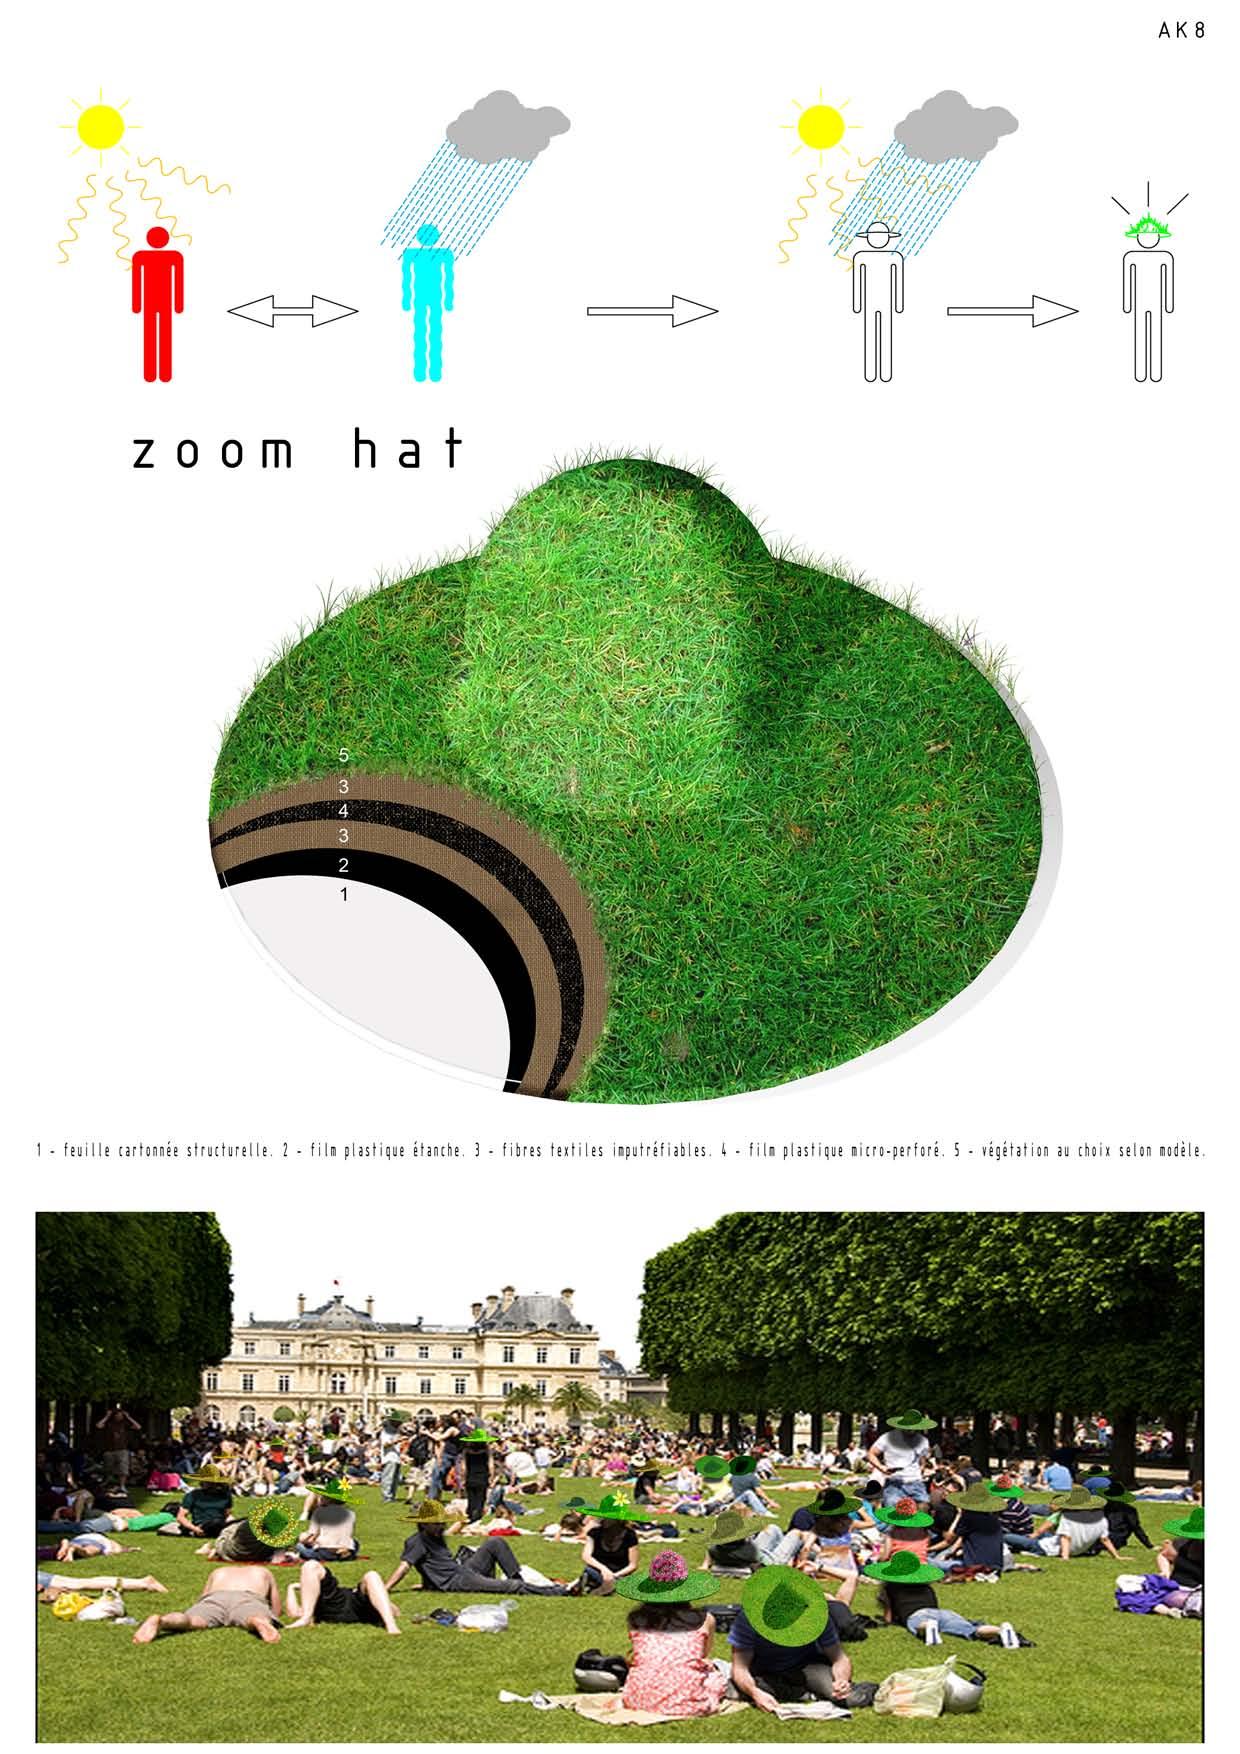 http://megaloportrait.free.fr/pix/VIP_Zoom%20Hat..jpg